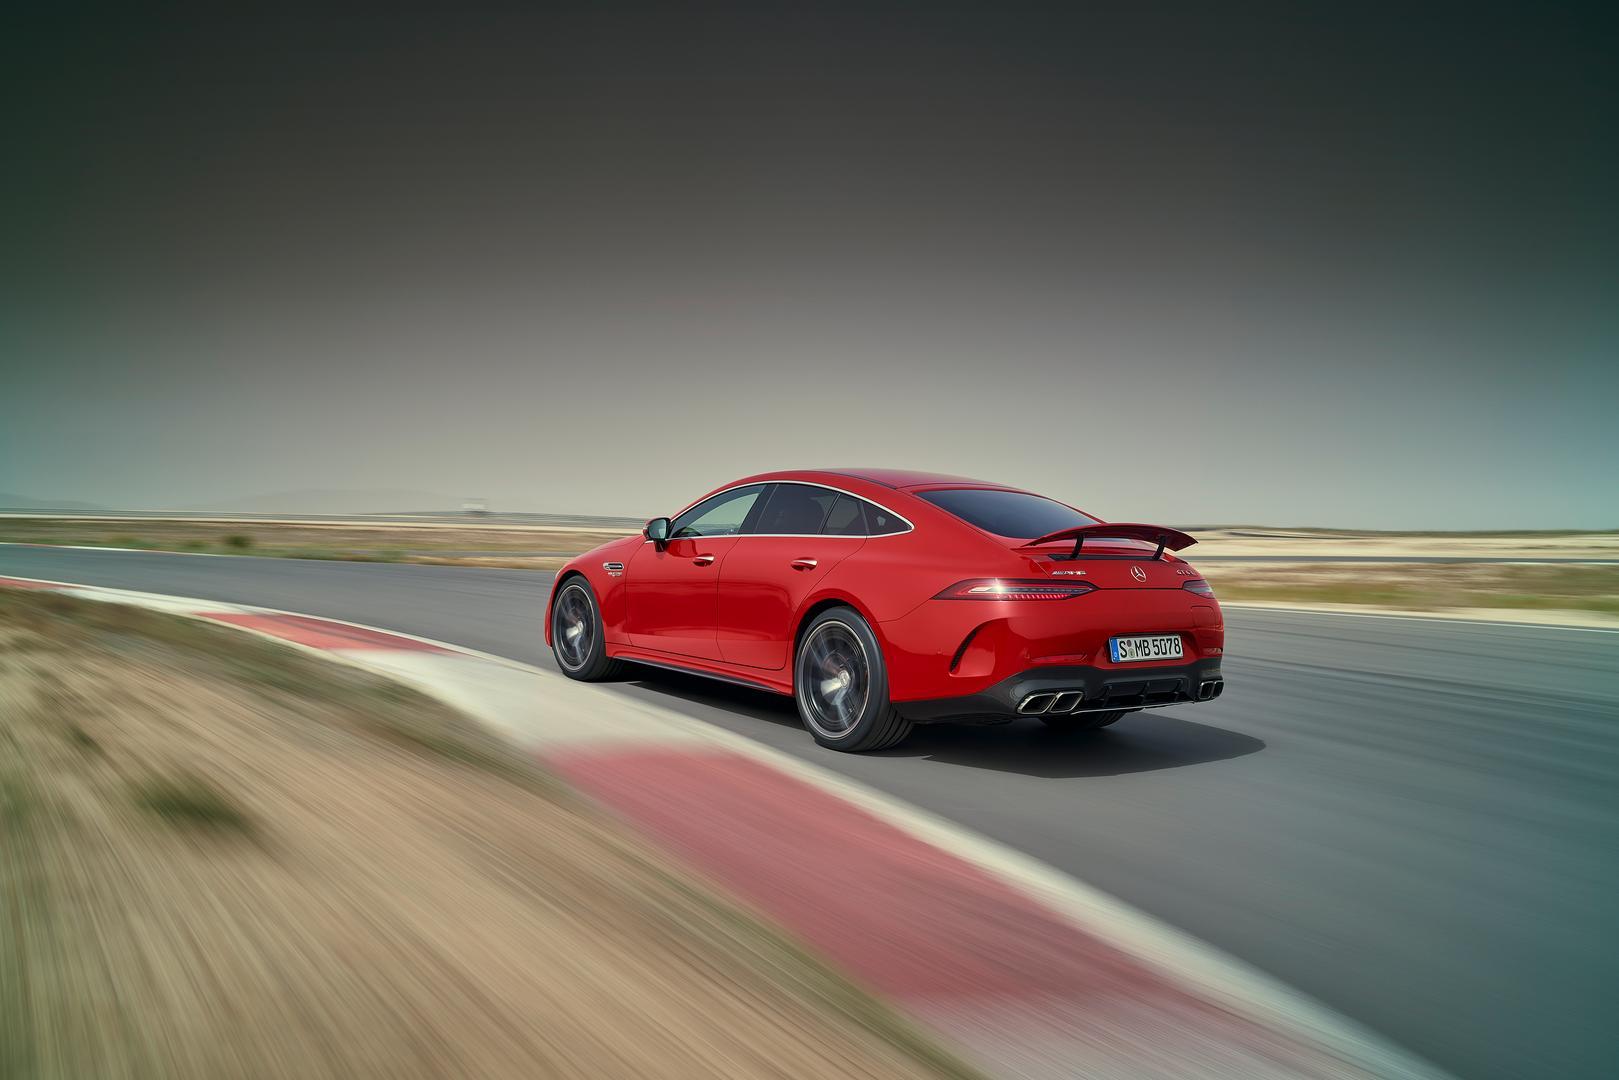 Mercedes-AMG GT 63 S E PERFORMANCE (4MATIC+), 2021Mercedes-AMG GT 63 S E PERFORMANCE rear